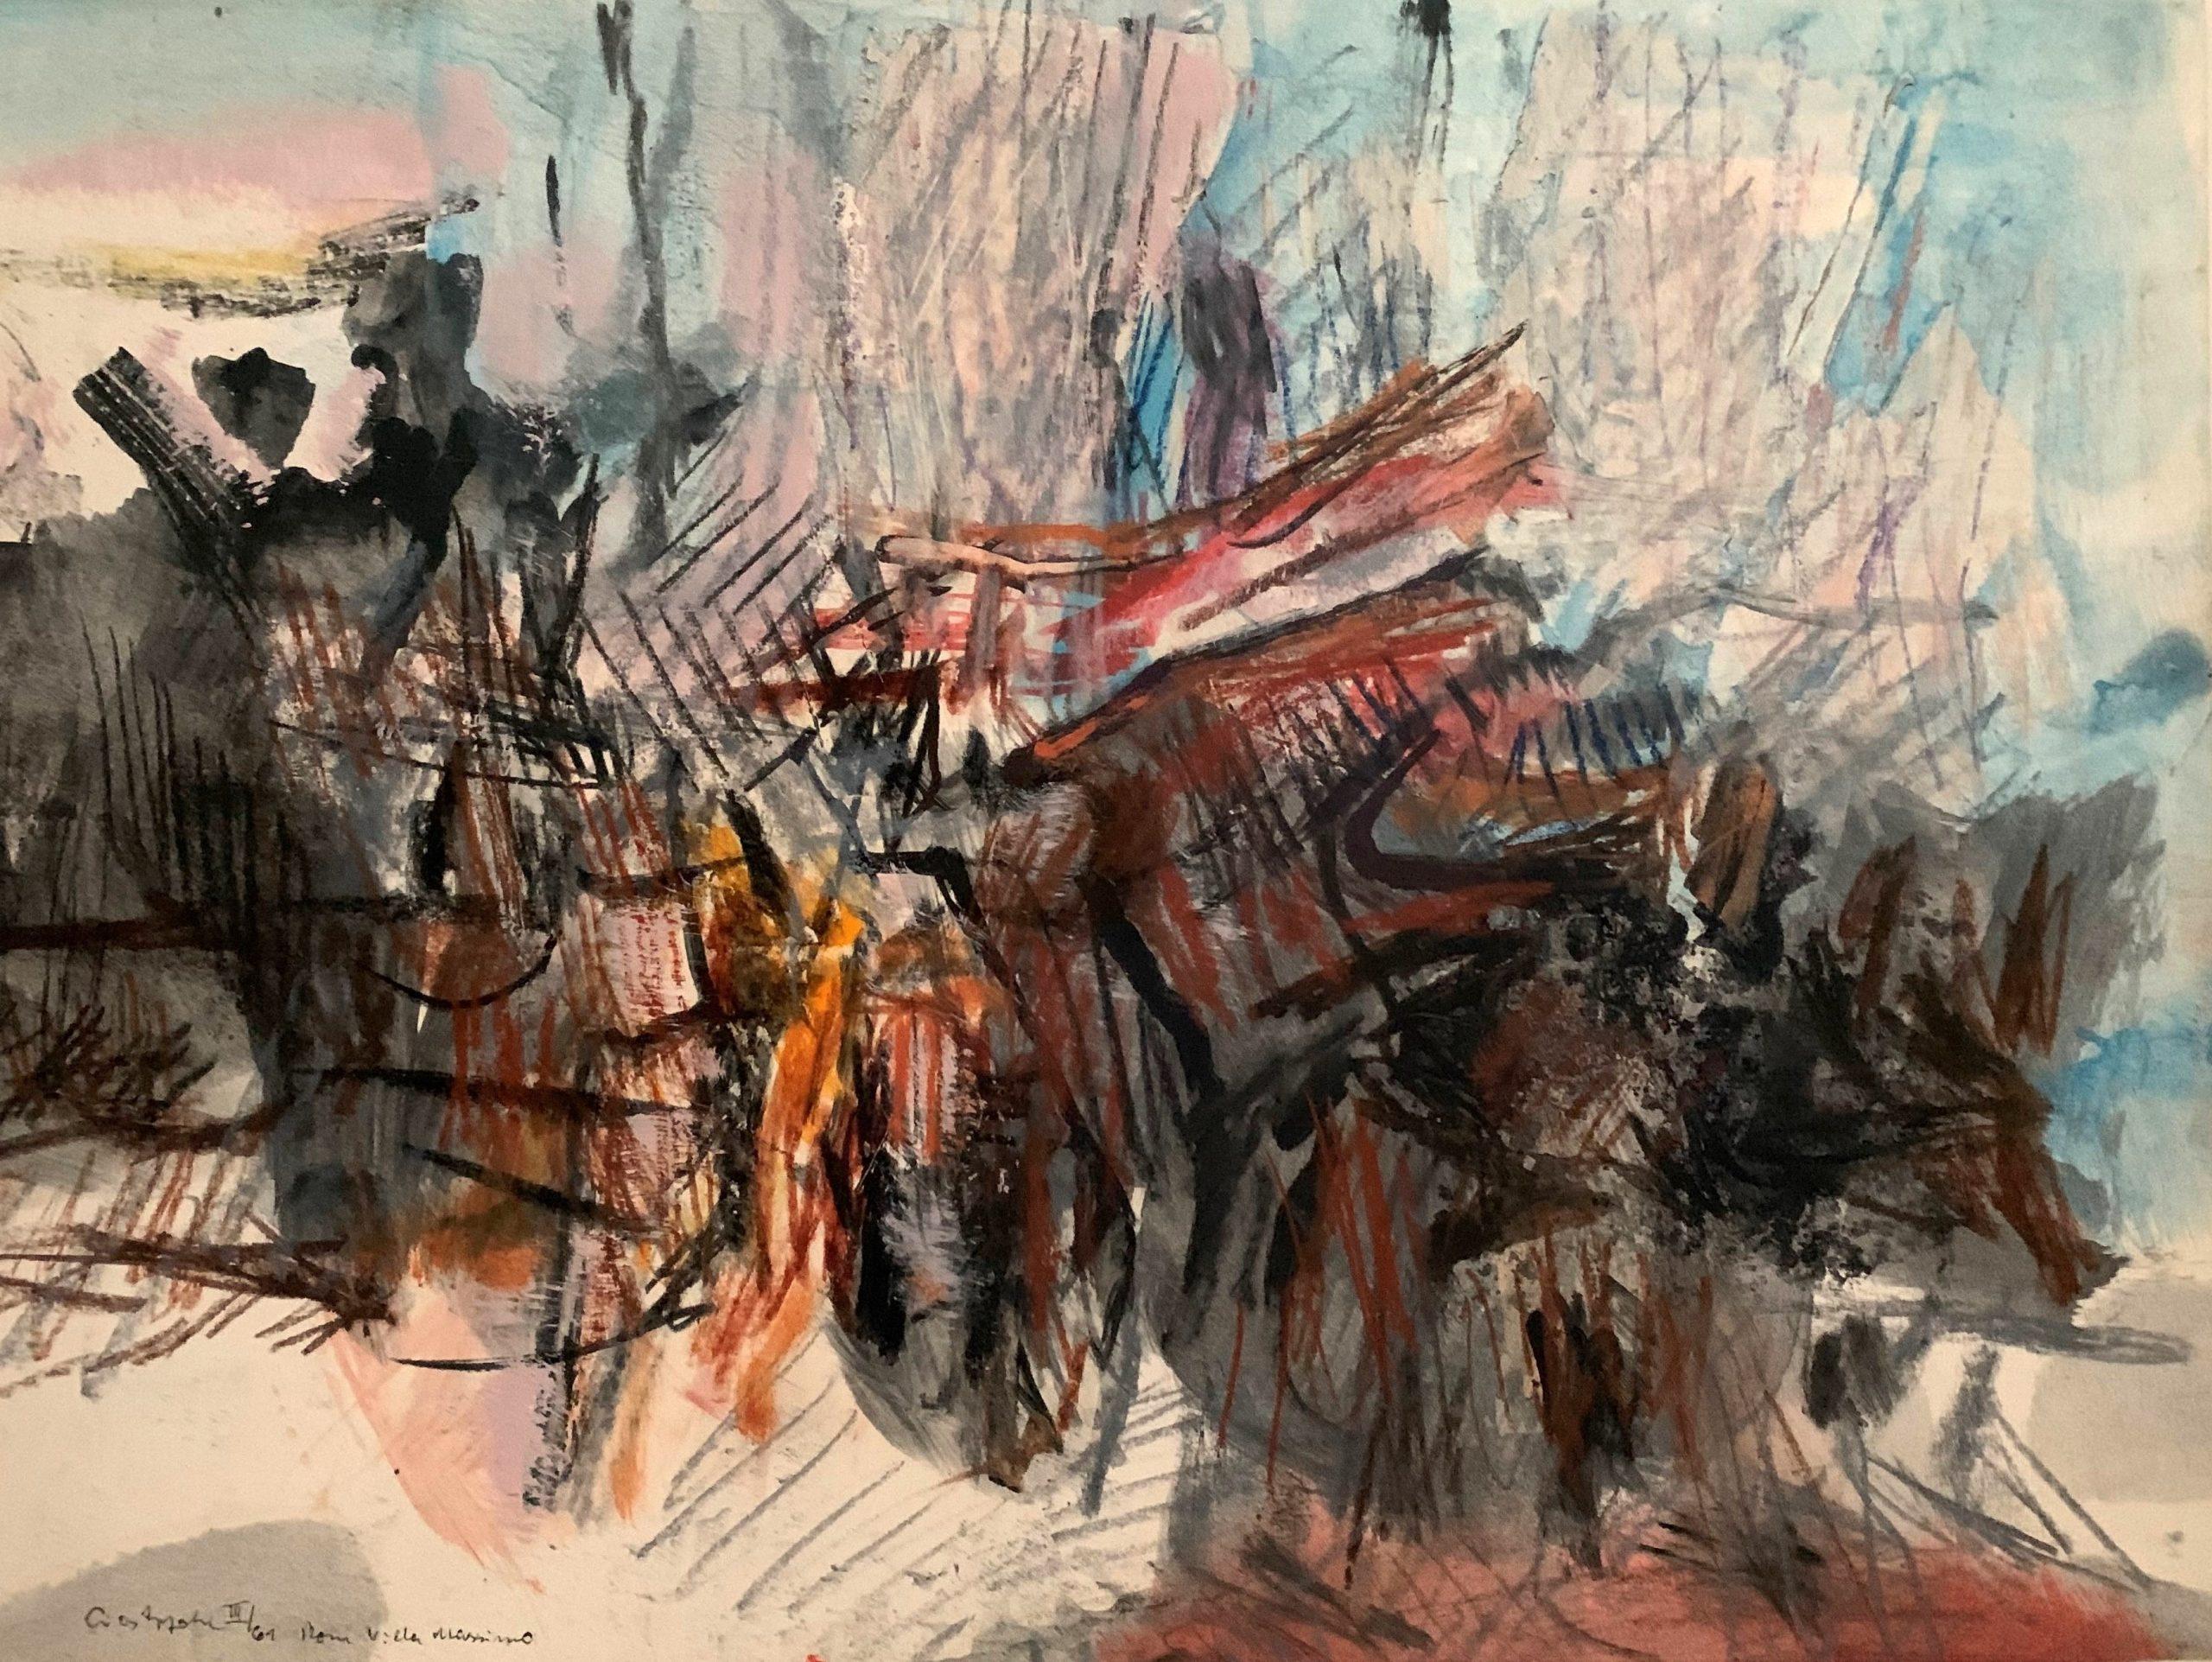 Galerie Maulberger Conrad Westpfahl (1961)